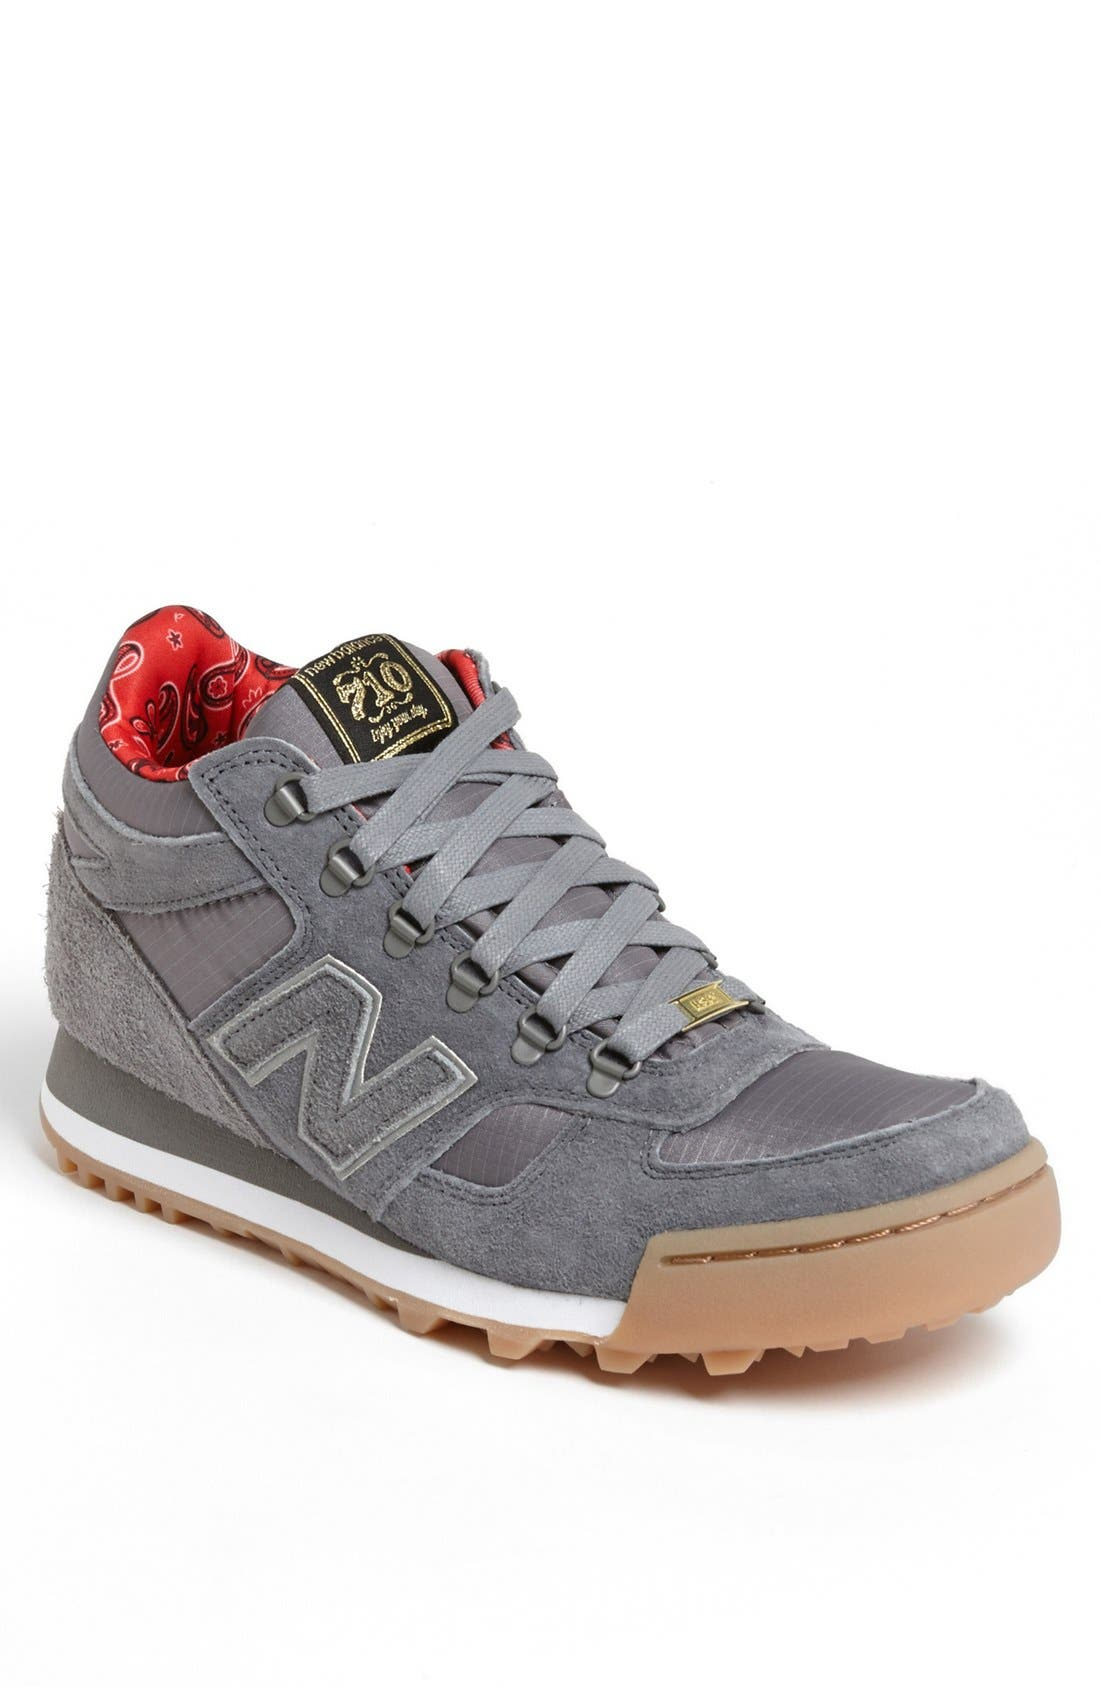 Alternate Image 1 Selected - New Balance 'Herschel Supply Co. - 710' Sneaker (Men)